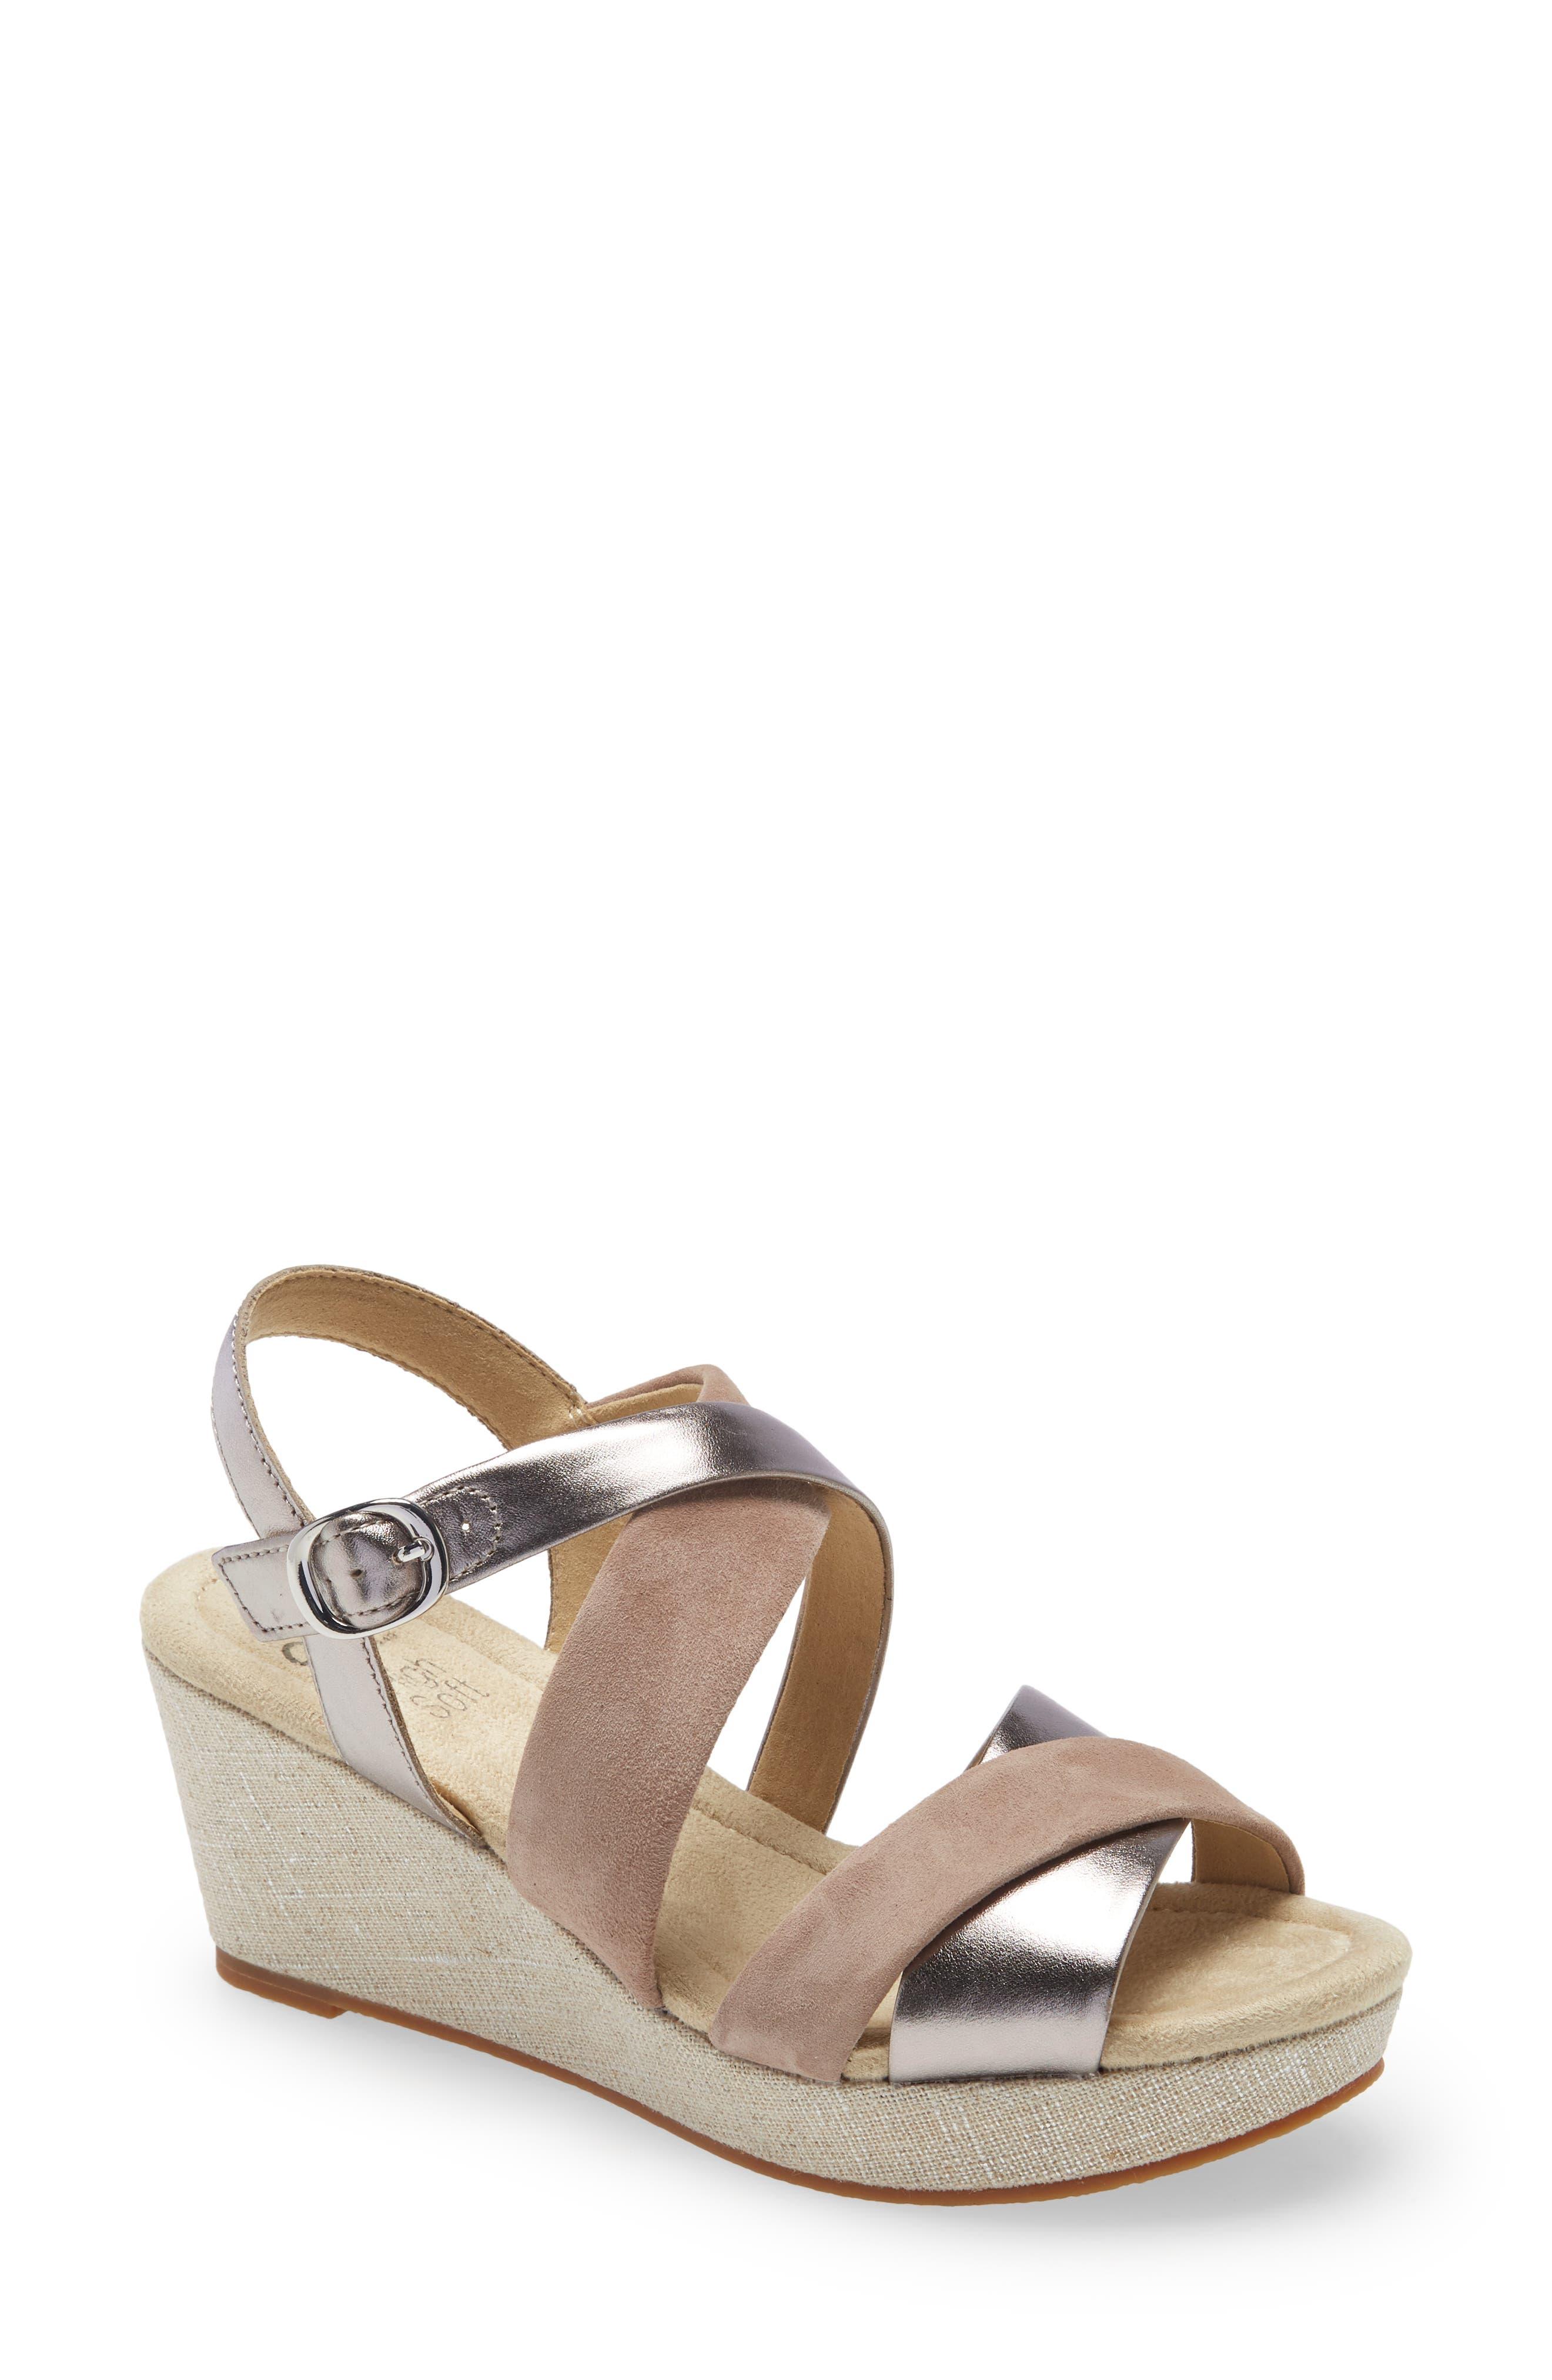 Robin Strappy Wedge Sandal